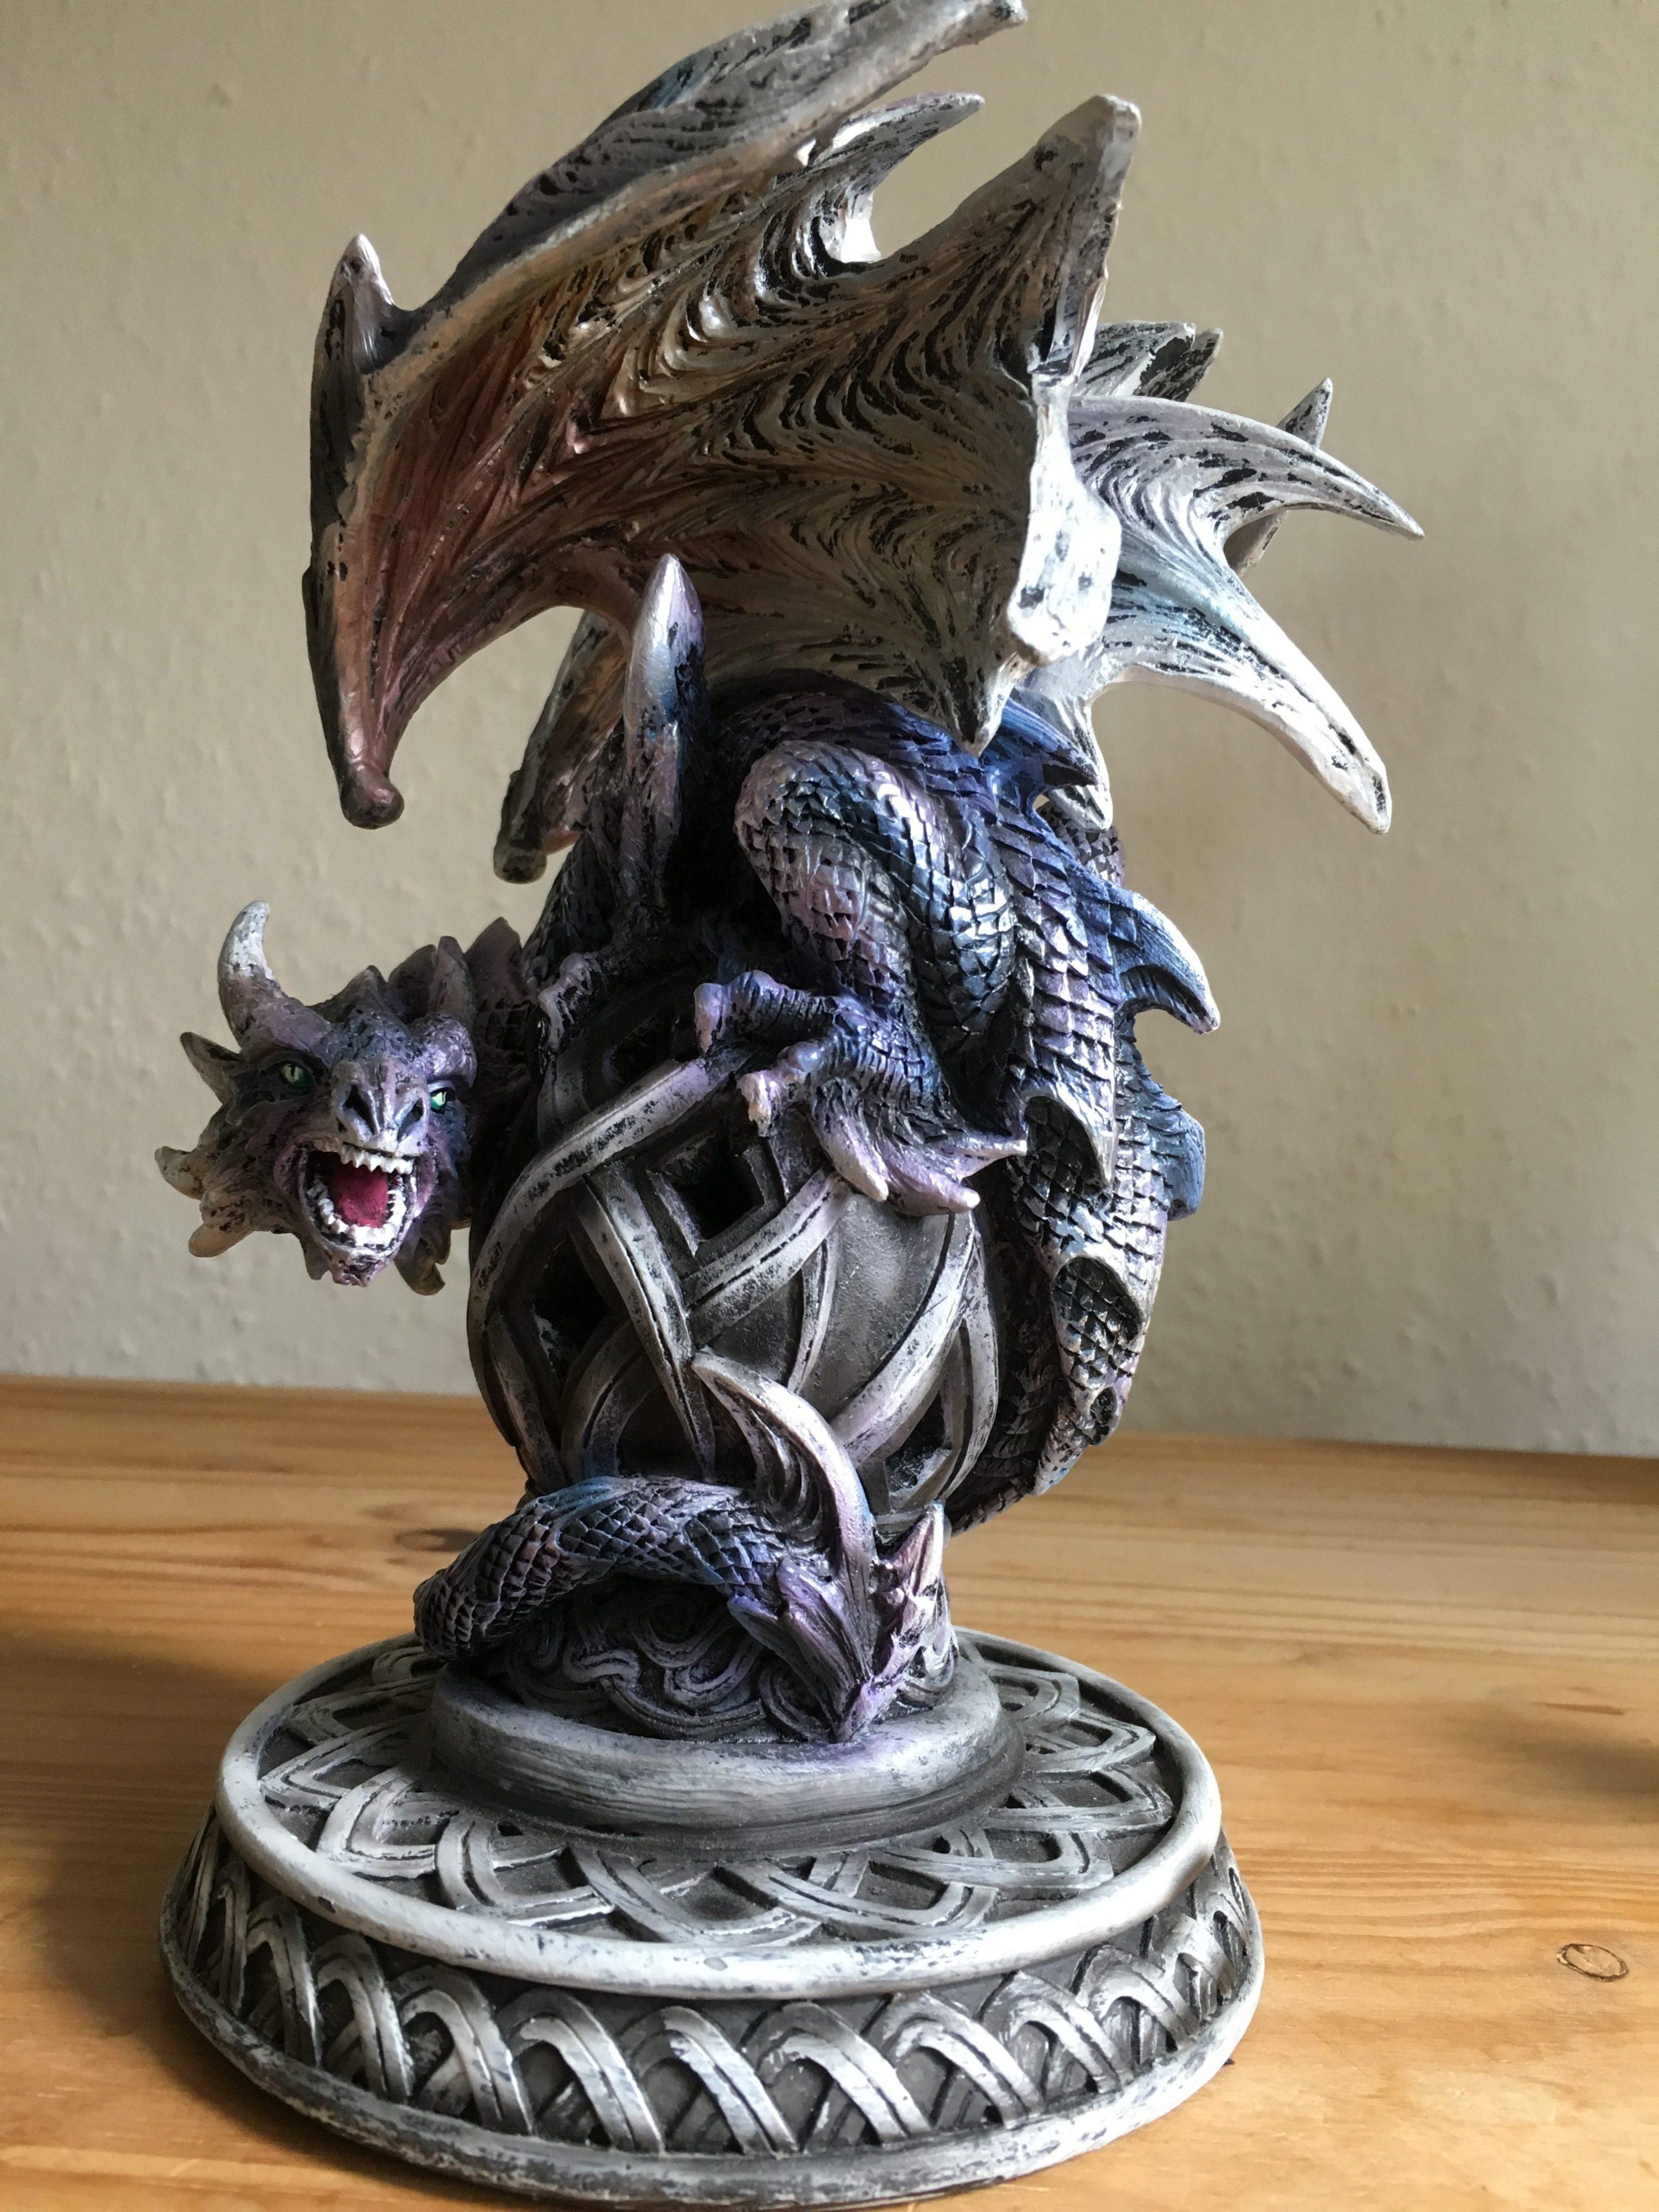 Purple, majestic dragon